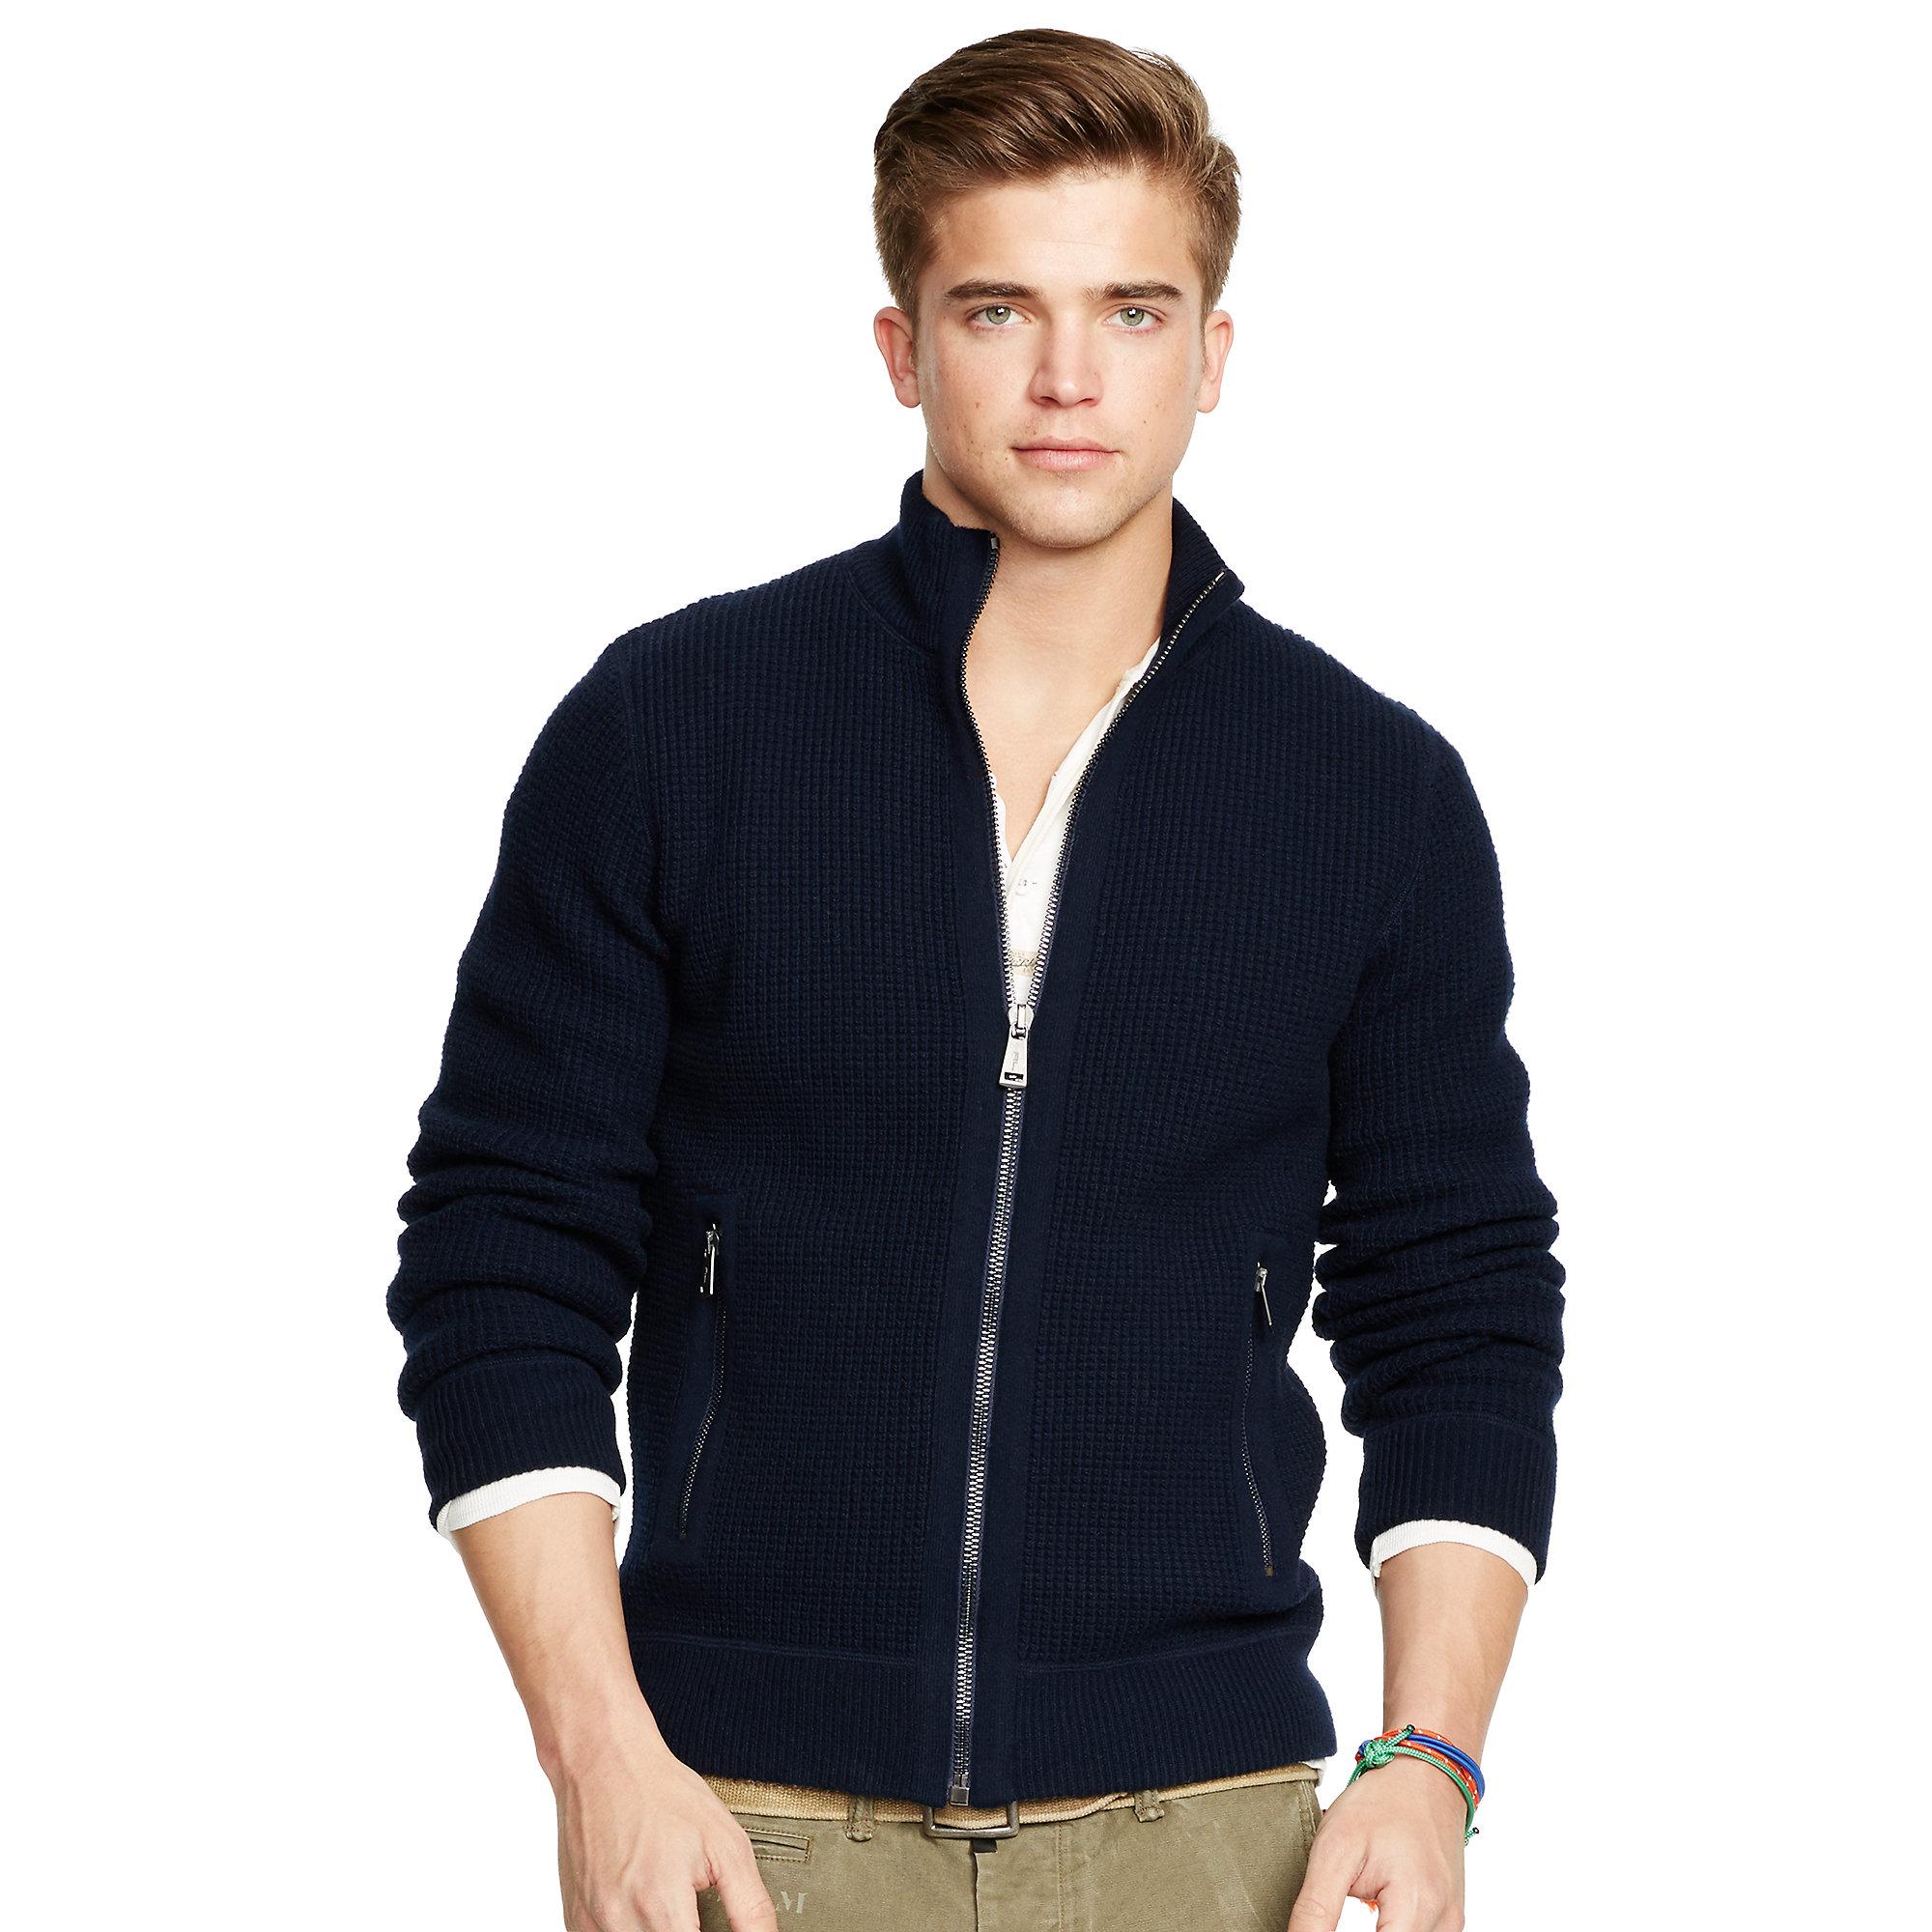 d314bd7960f Lyst - Polo Ralph Lauren Wool-blend Full-zip Sweater in .